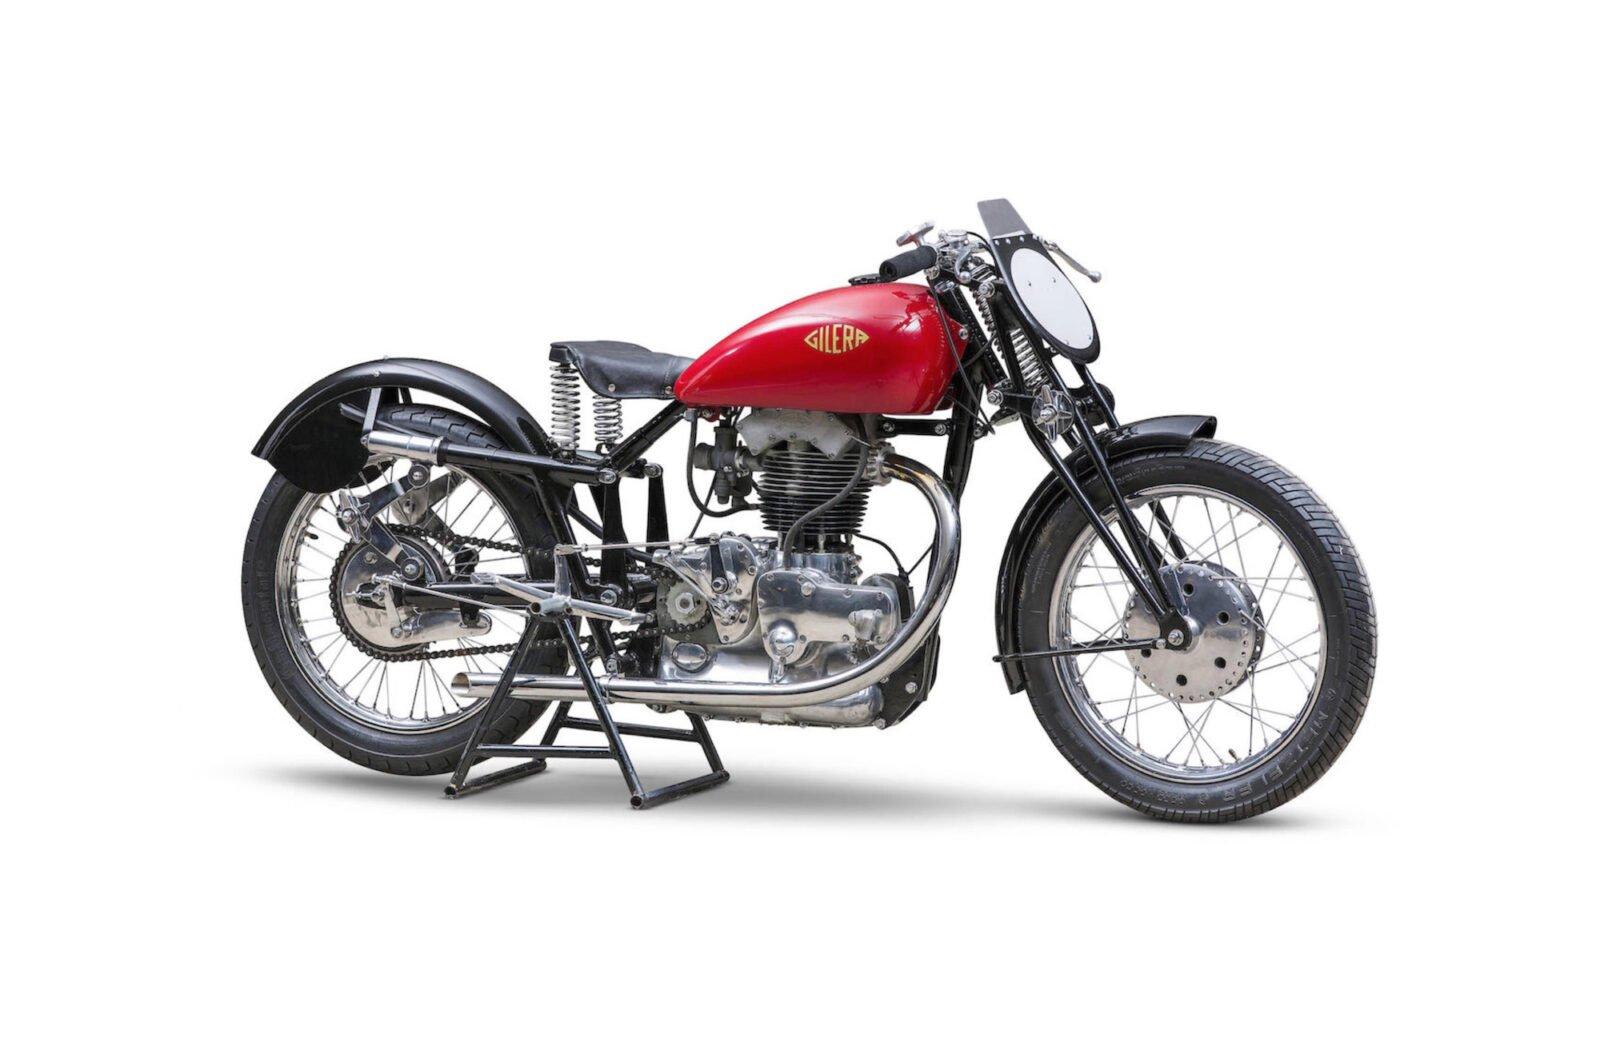 Gilera Saturno Motorcycle 10 1600x1062 - Gilera Saturno